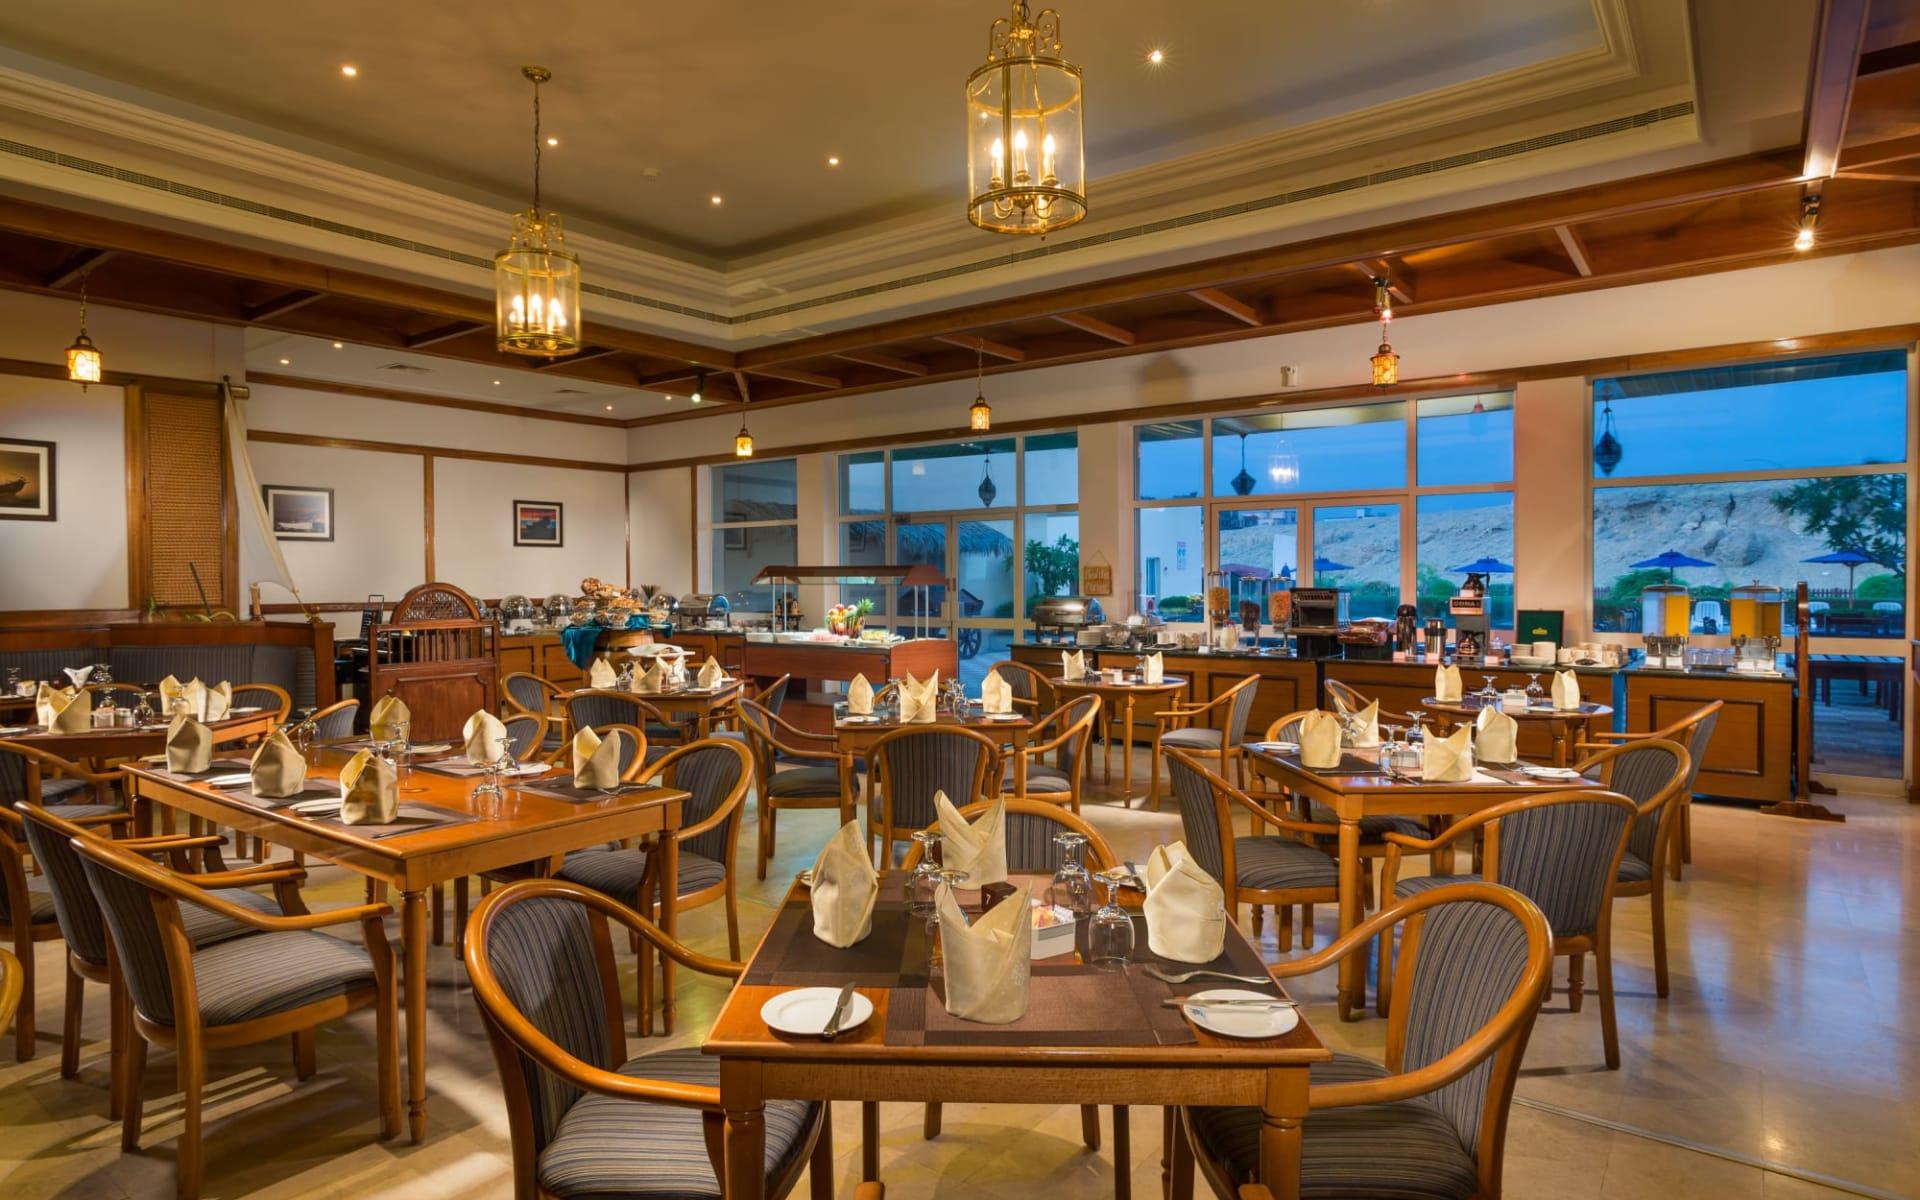 Sur Plaza Hotel: